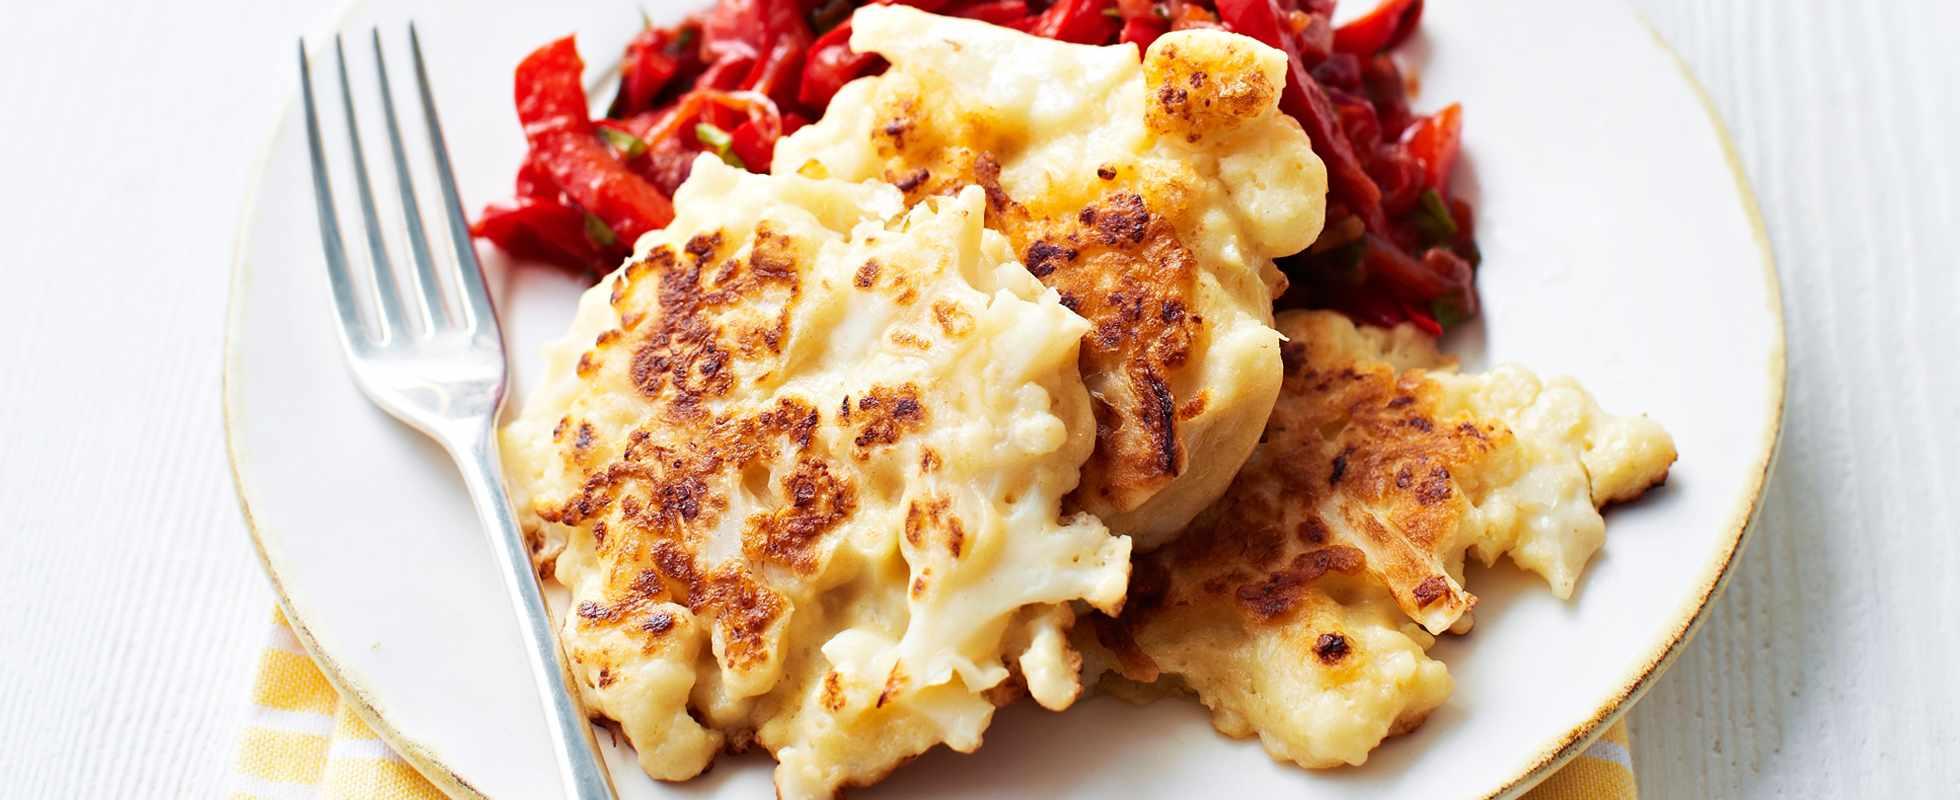 Cauliflower Fritters Recipe with Peperonata